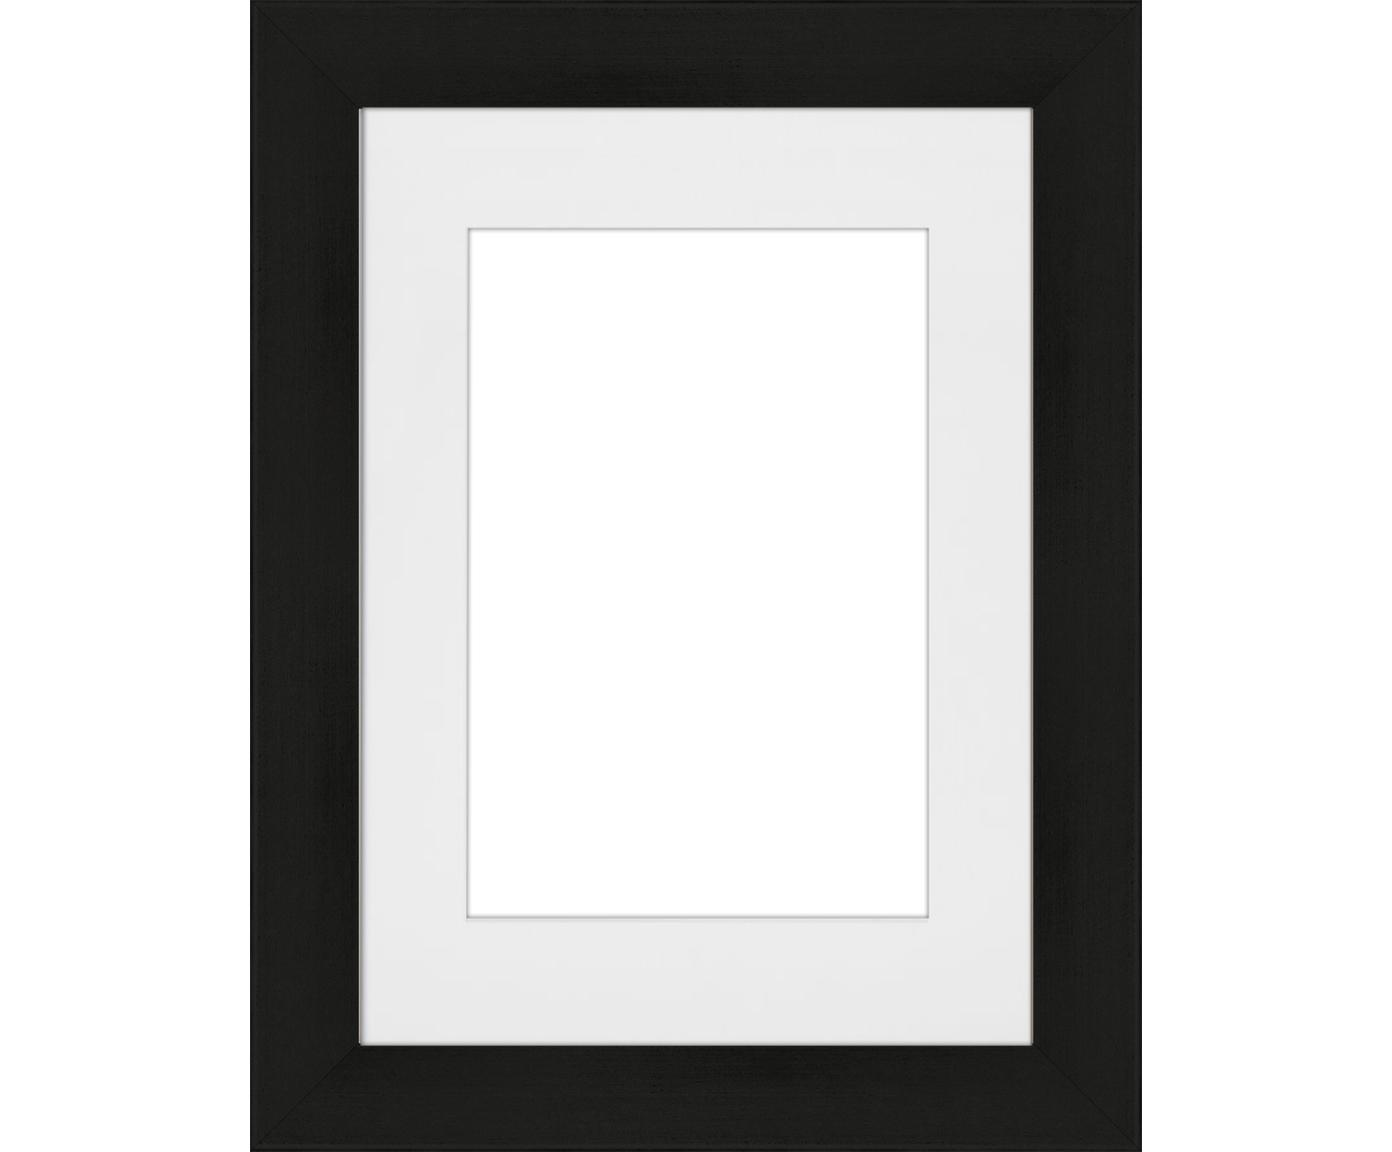 Ramka na zdjęcia Apollon, Czarny, 13 x 18 cm